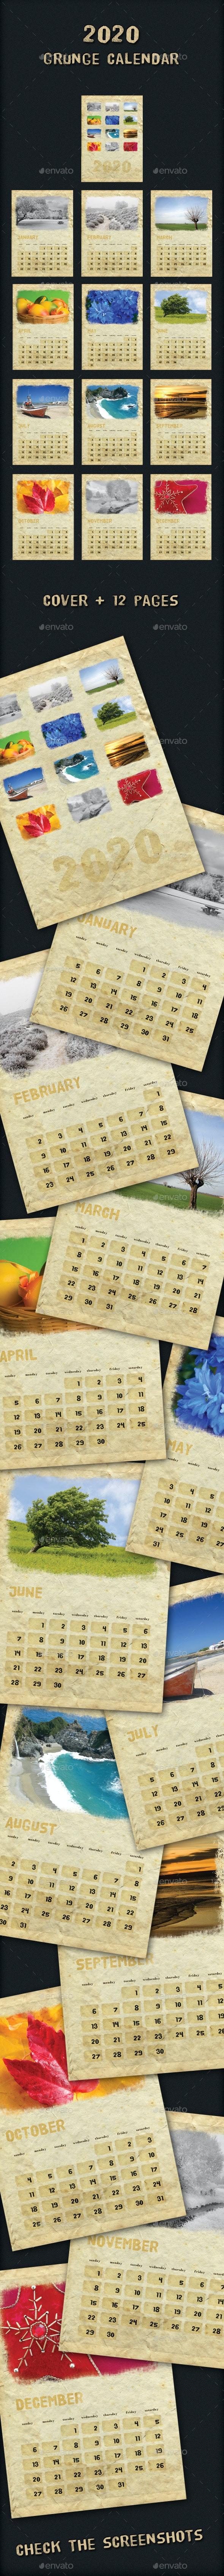 2020 Grunge Calendar - Calendars Stationery